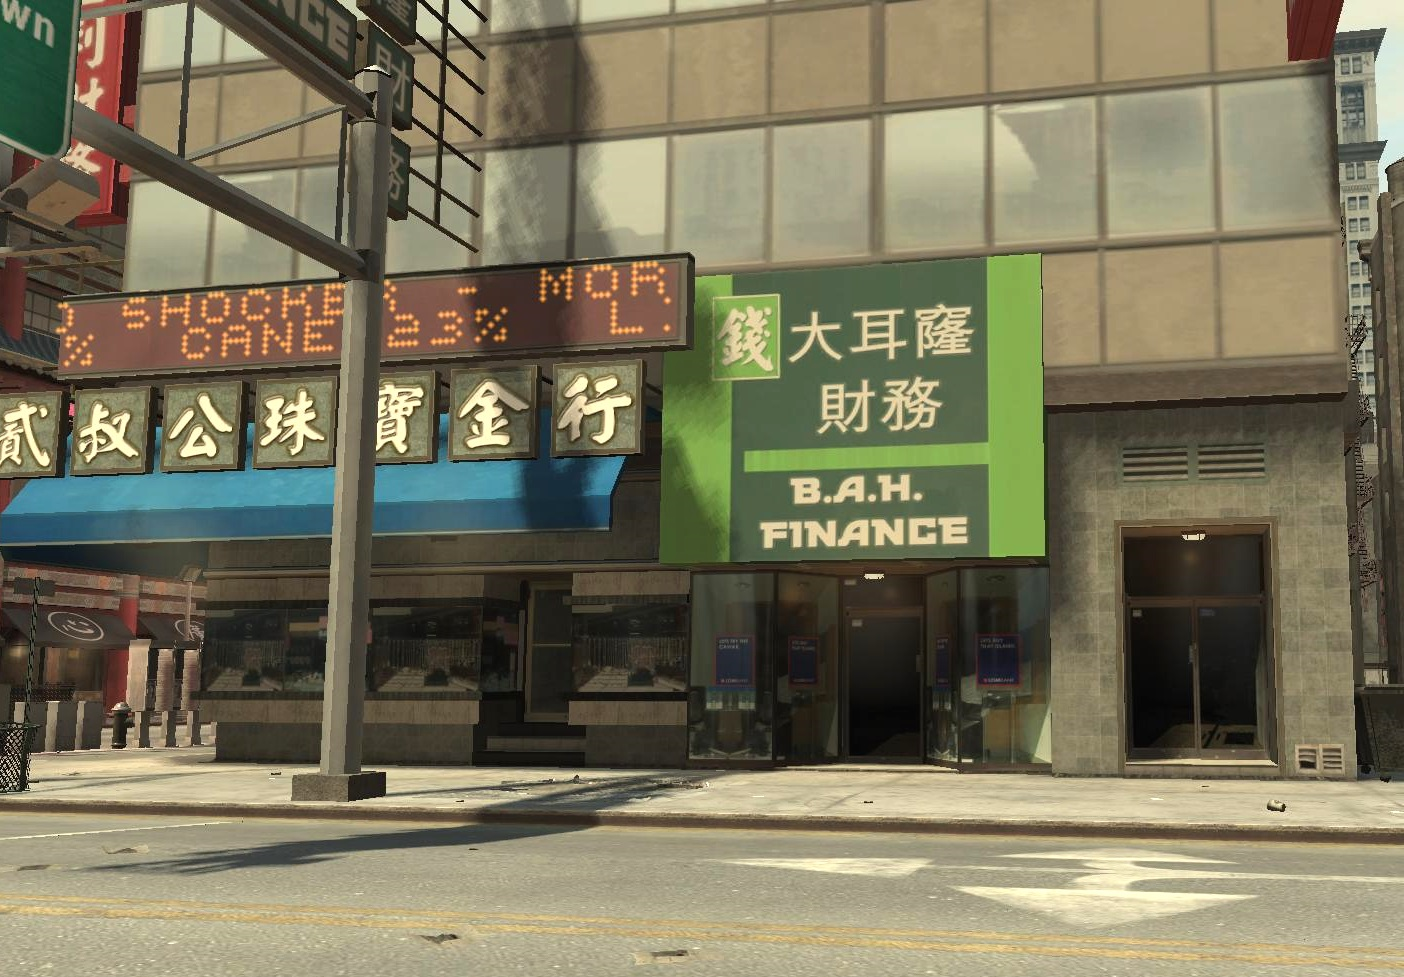 B.A.H. Finance